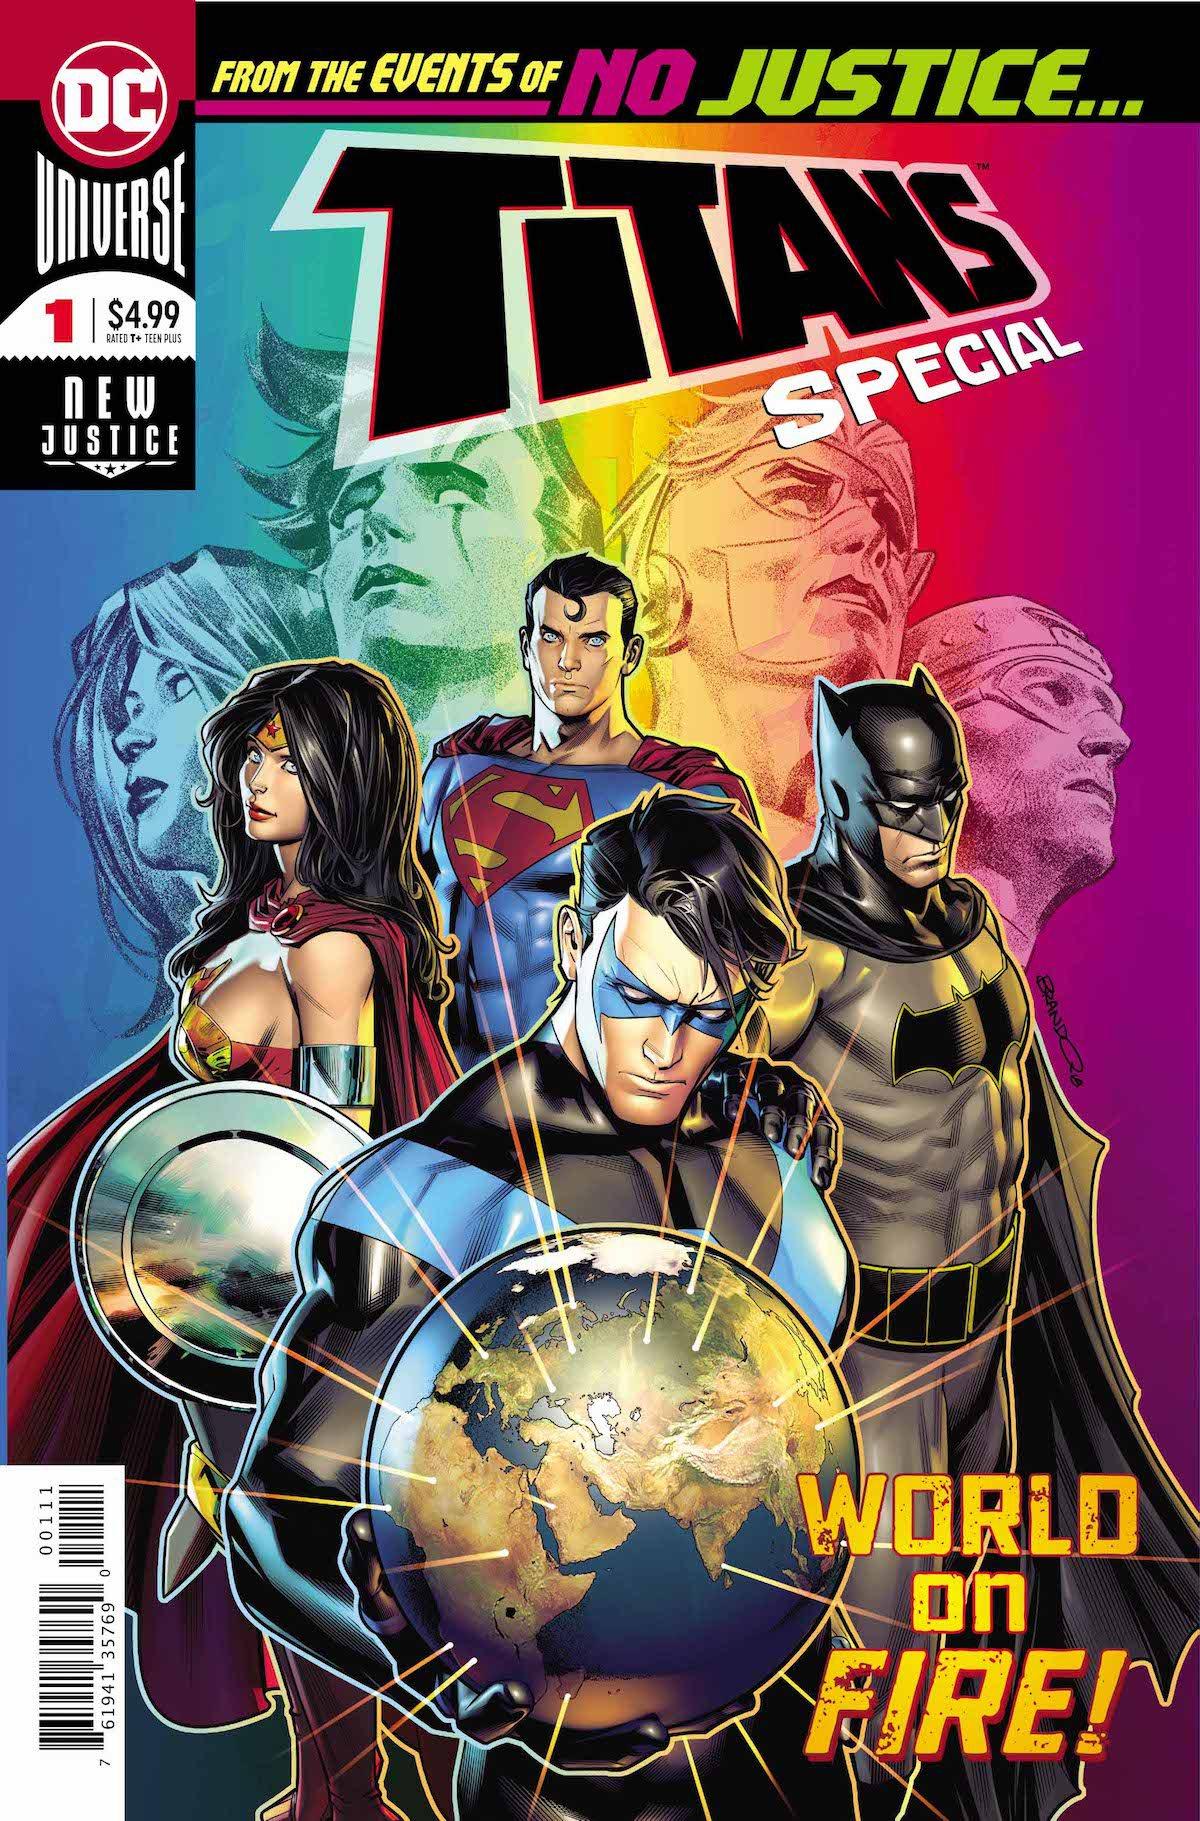 Titans Special #1 cover